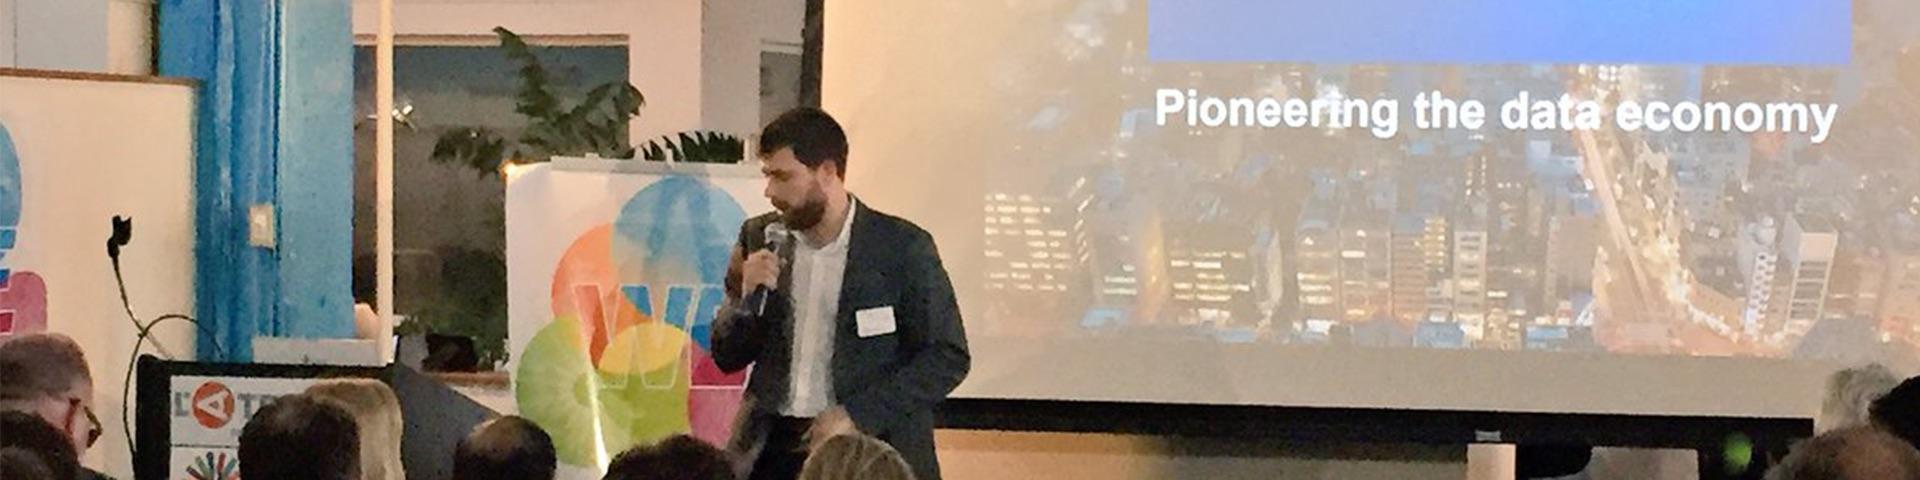 19 avril - Pitch Smart City au French Tech Hub